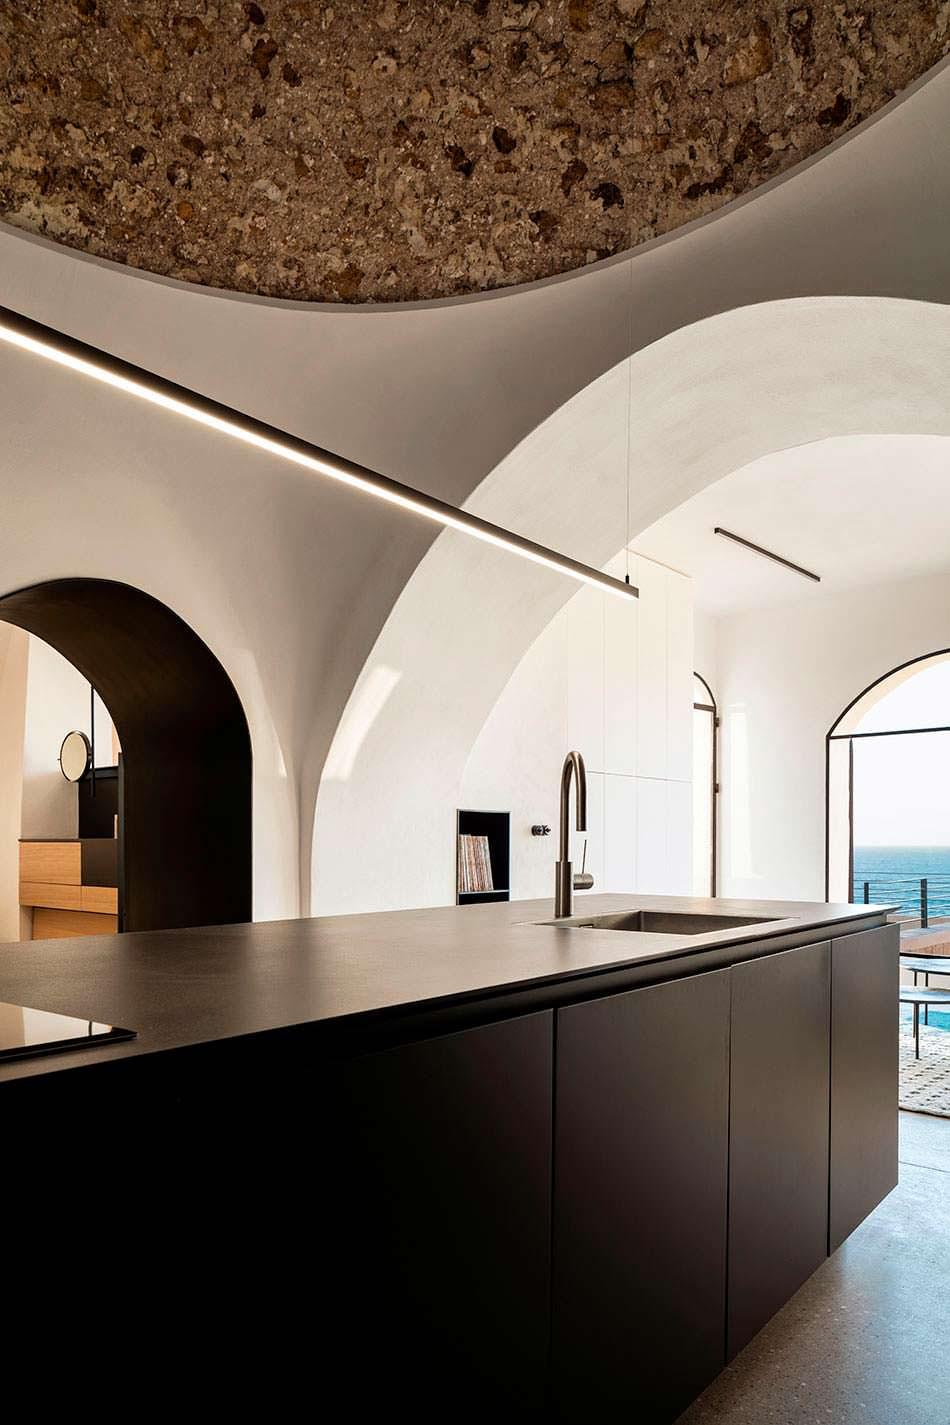 Дизайн кухни в стиле минимализм в квартире-пещере